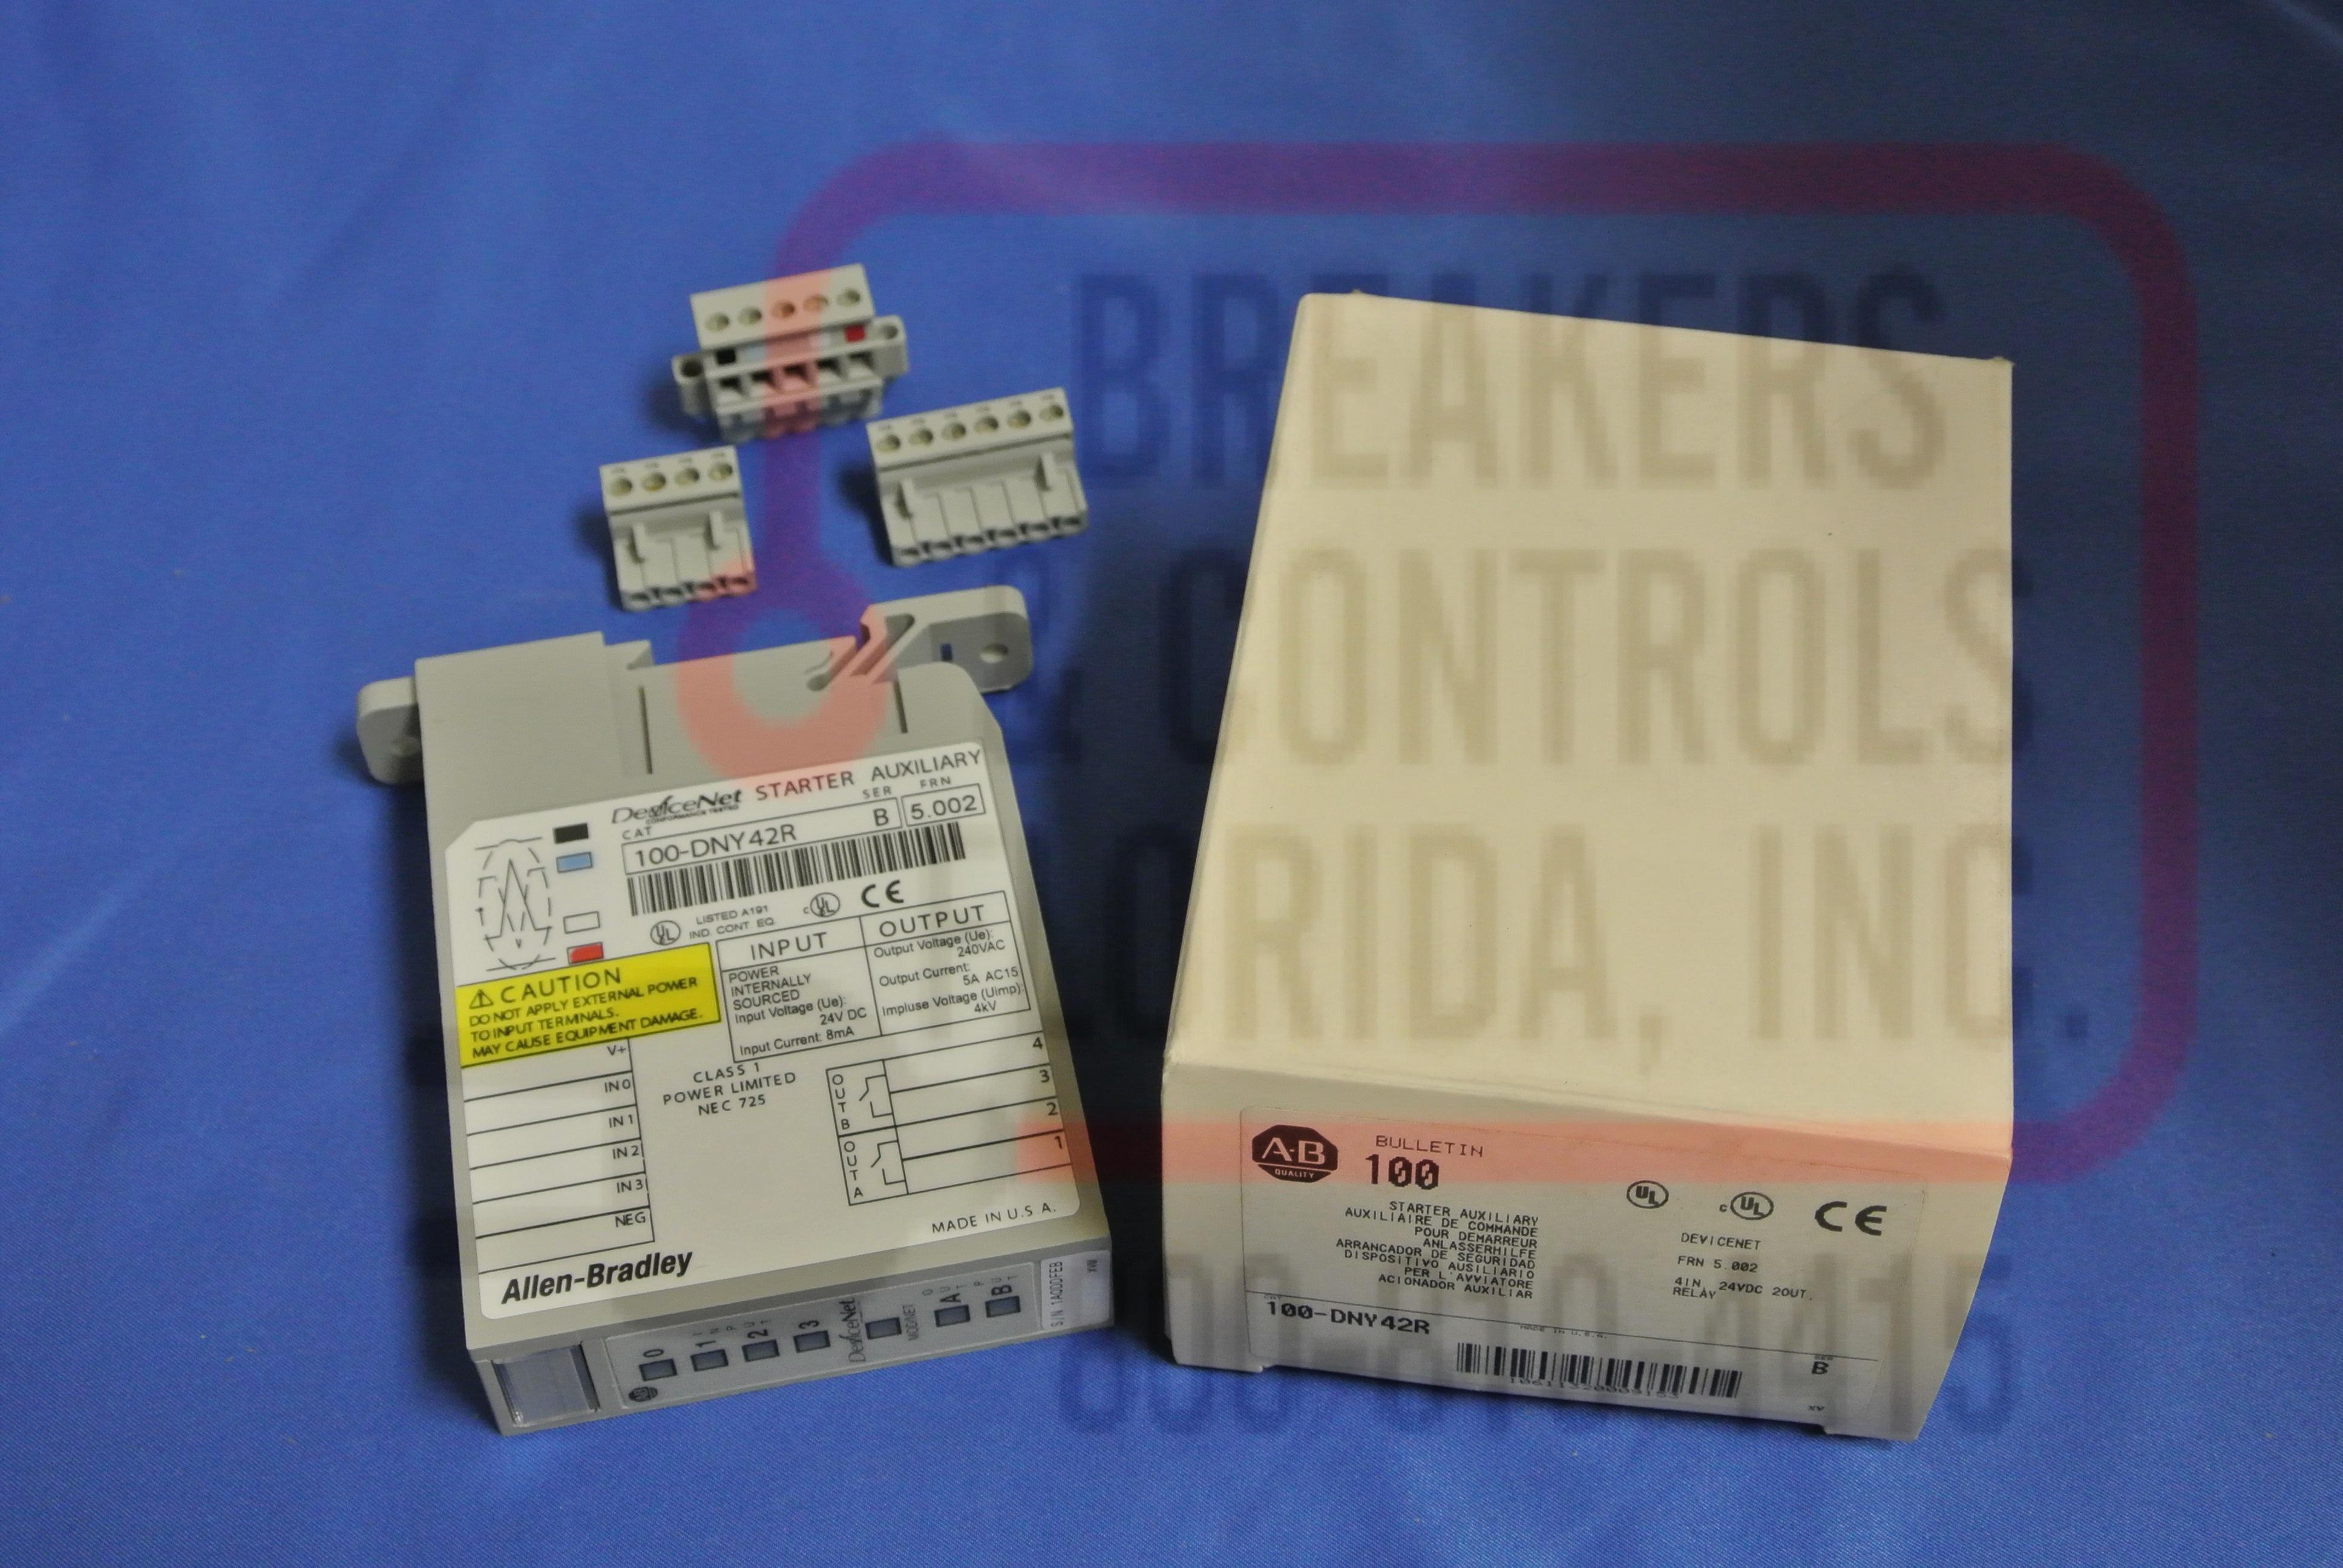 Allen Bradley 100DNY42R1 RELAY 4IN 24VDC 2OUT 250V DISTRIBUTED STARTER DSA